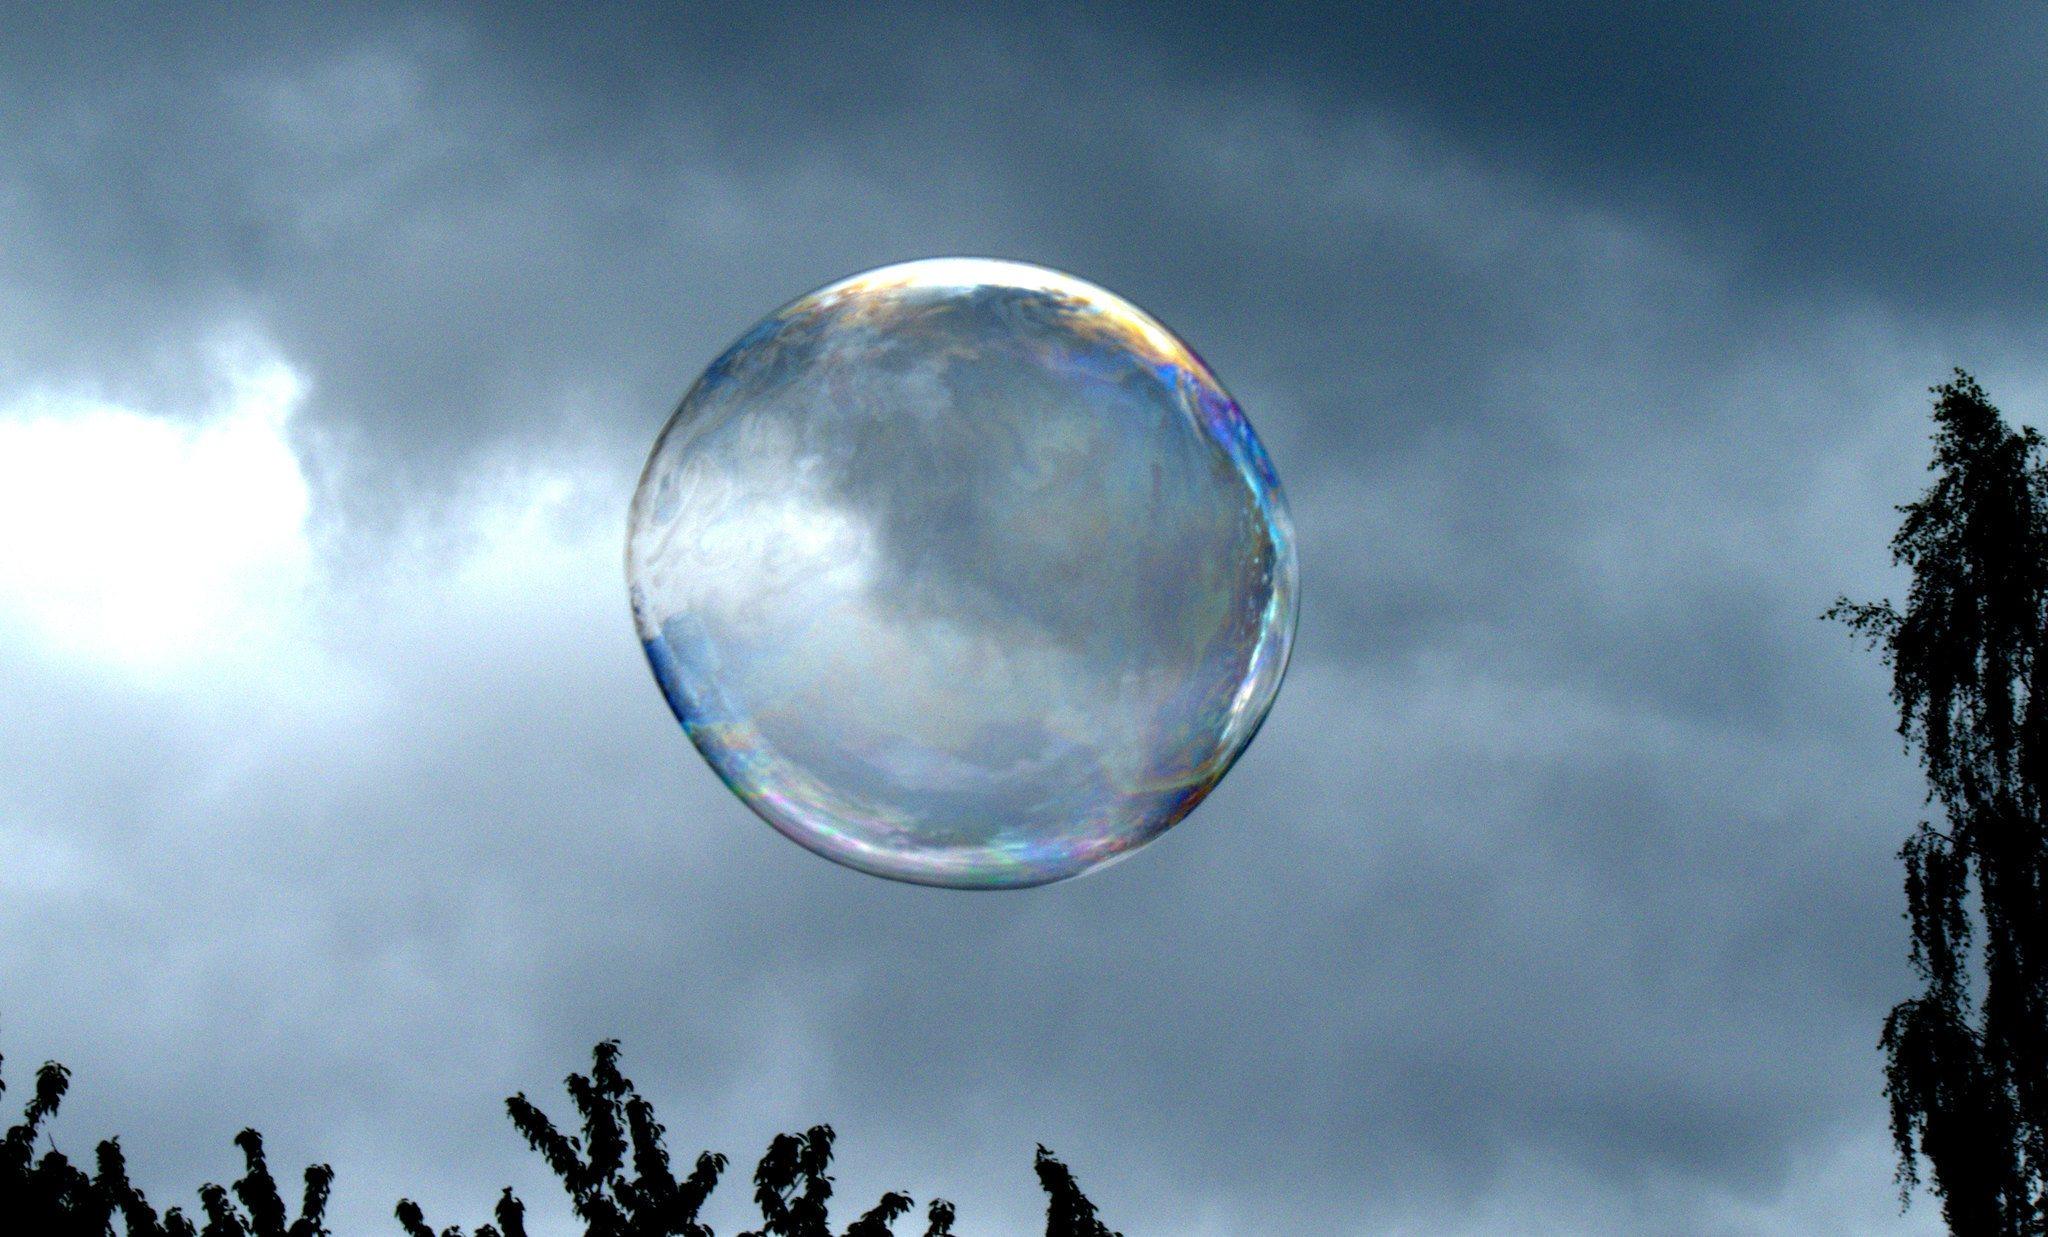 Huge soap bubble